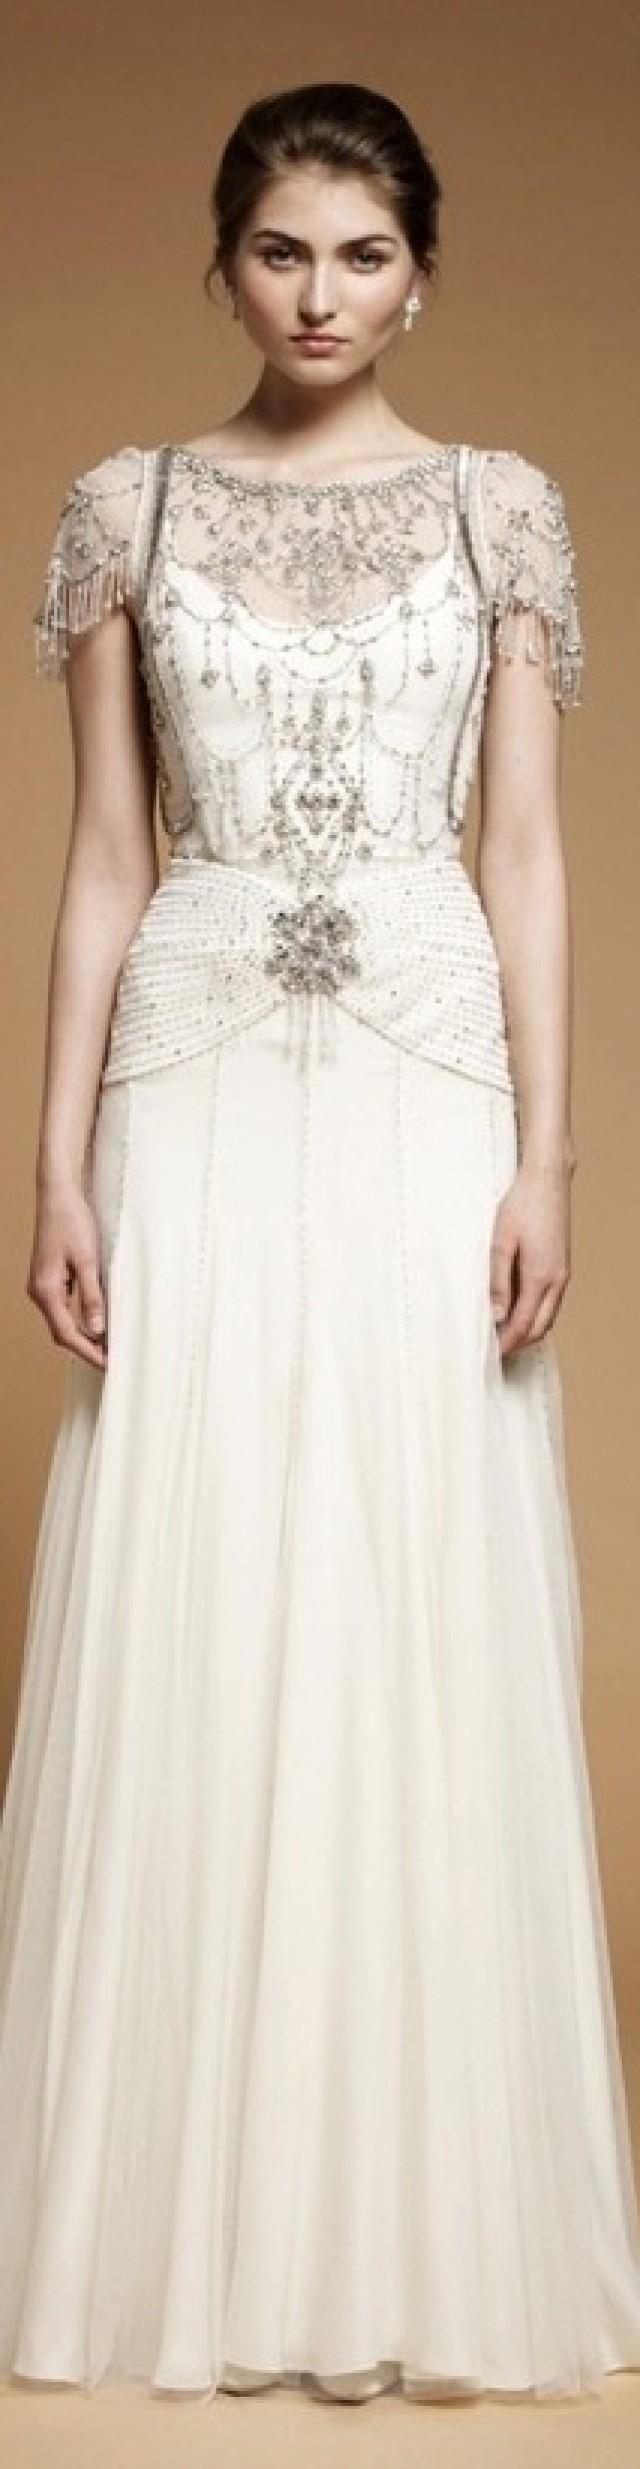 jenny packham damask - Google Search | Wedding Inspiration ...